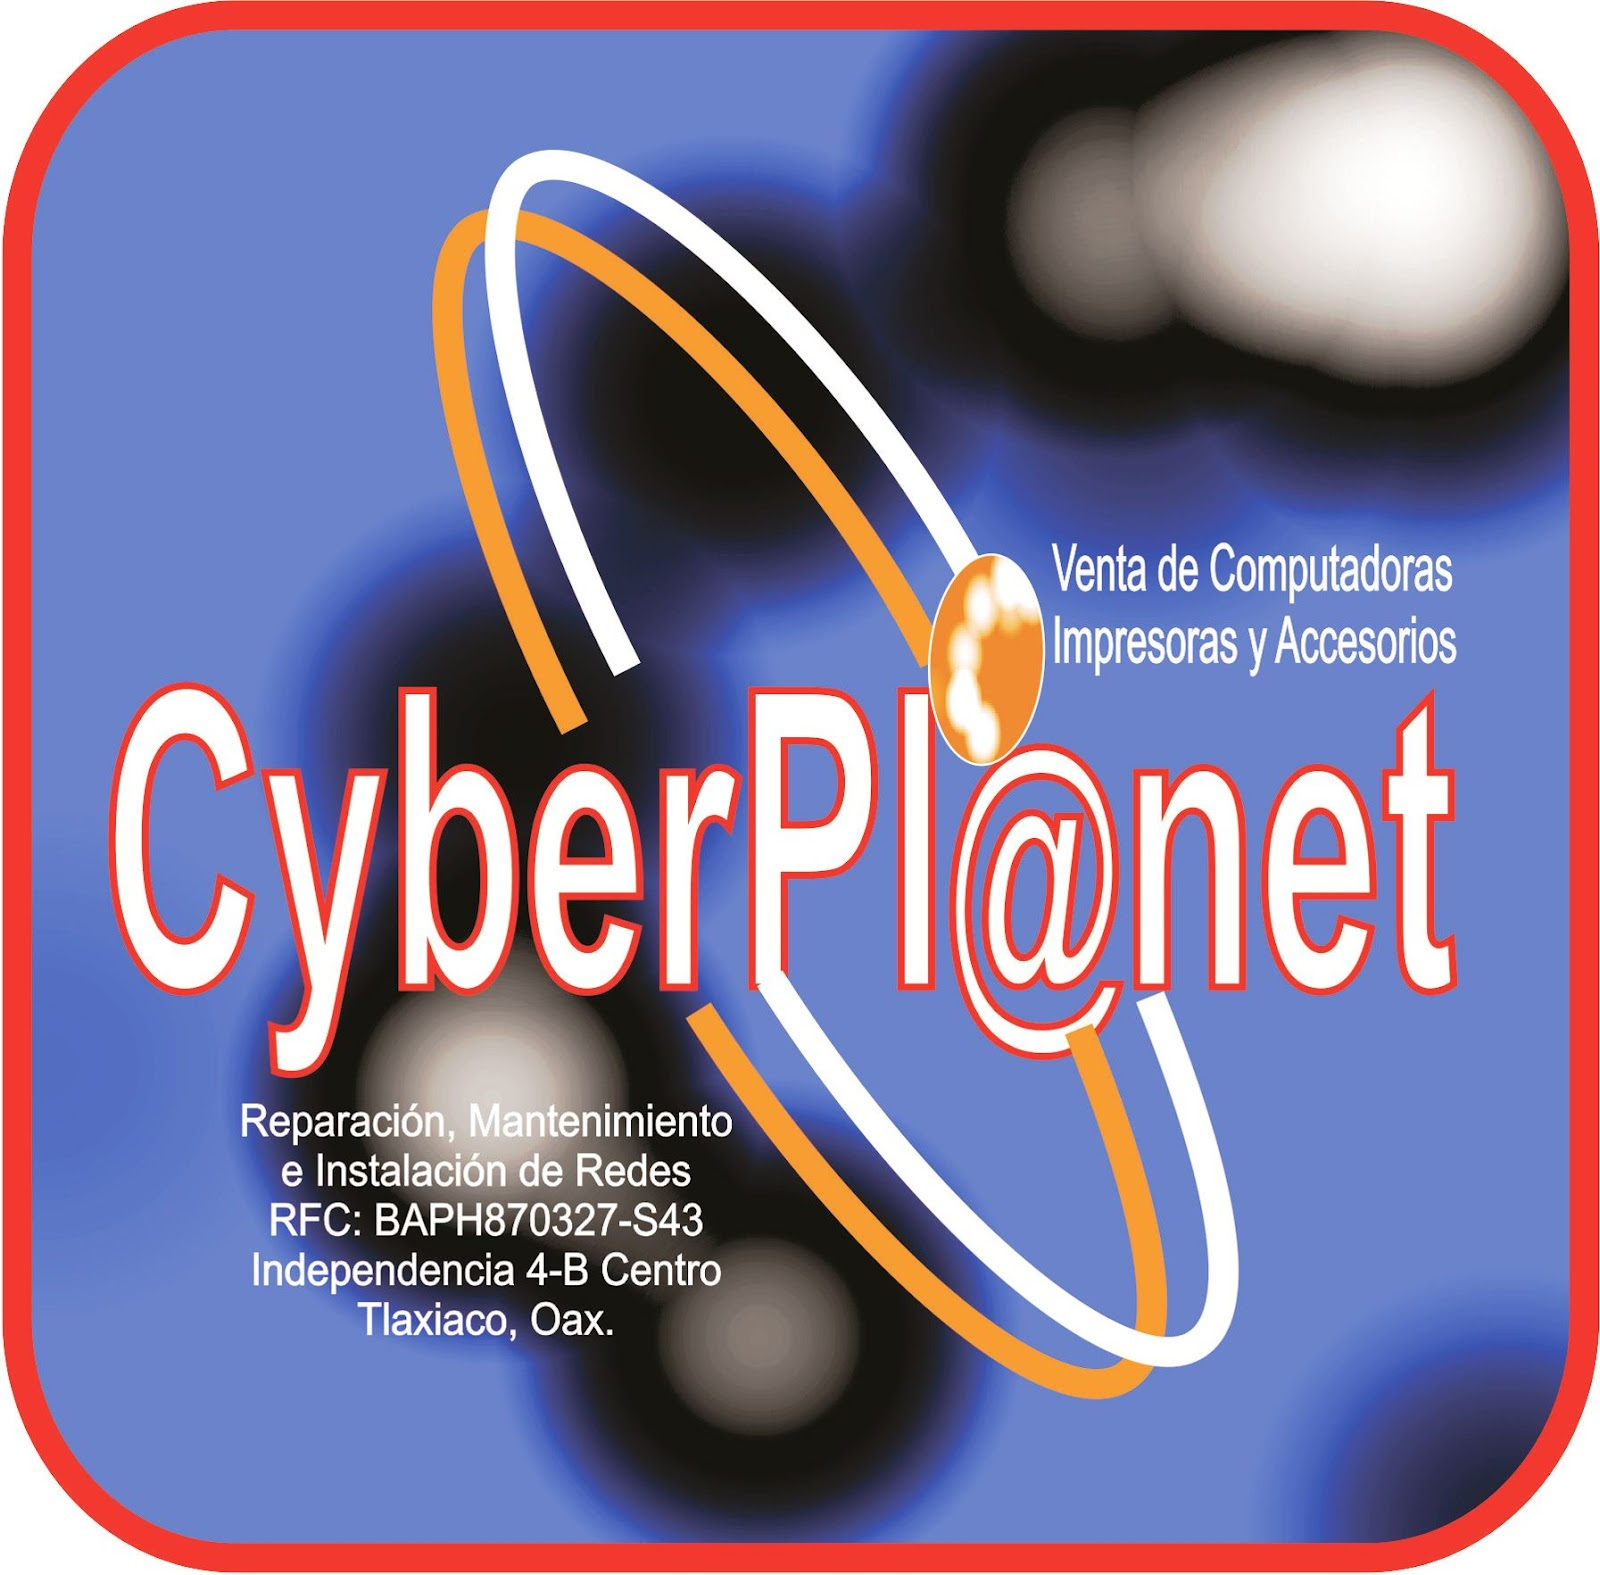 descargar cyberplanet gratis